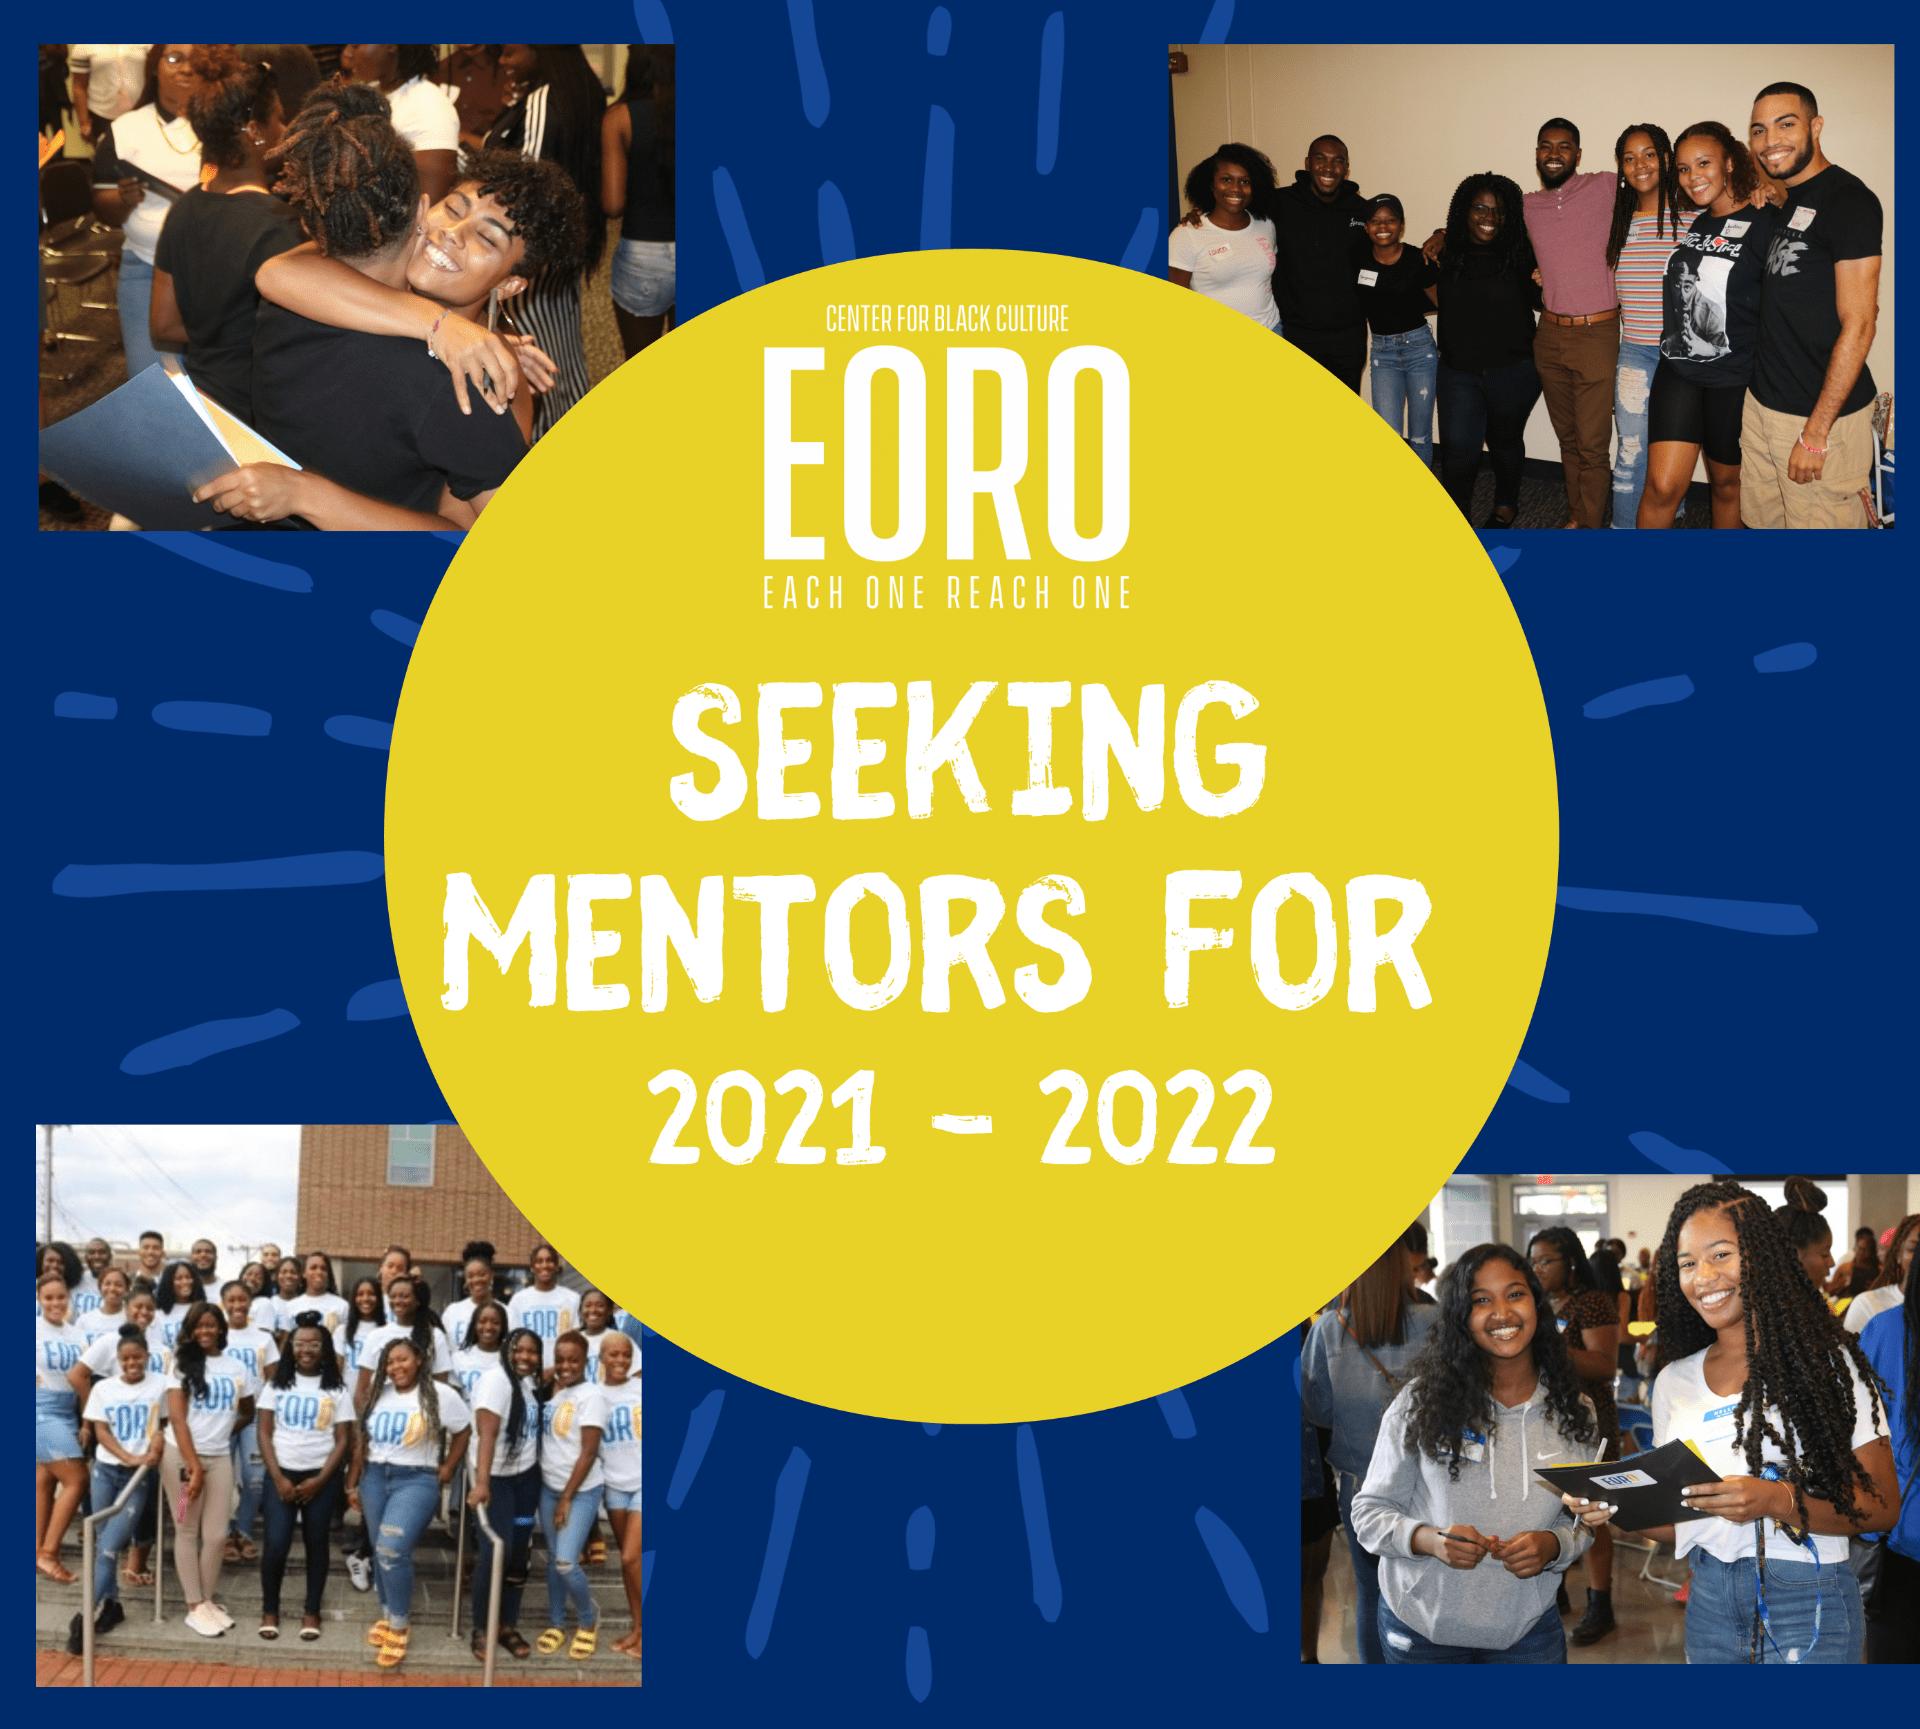 Each One Reach One - Seeking Mentors for 2021-2022